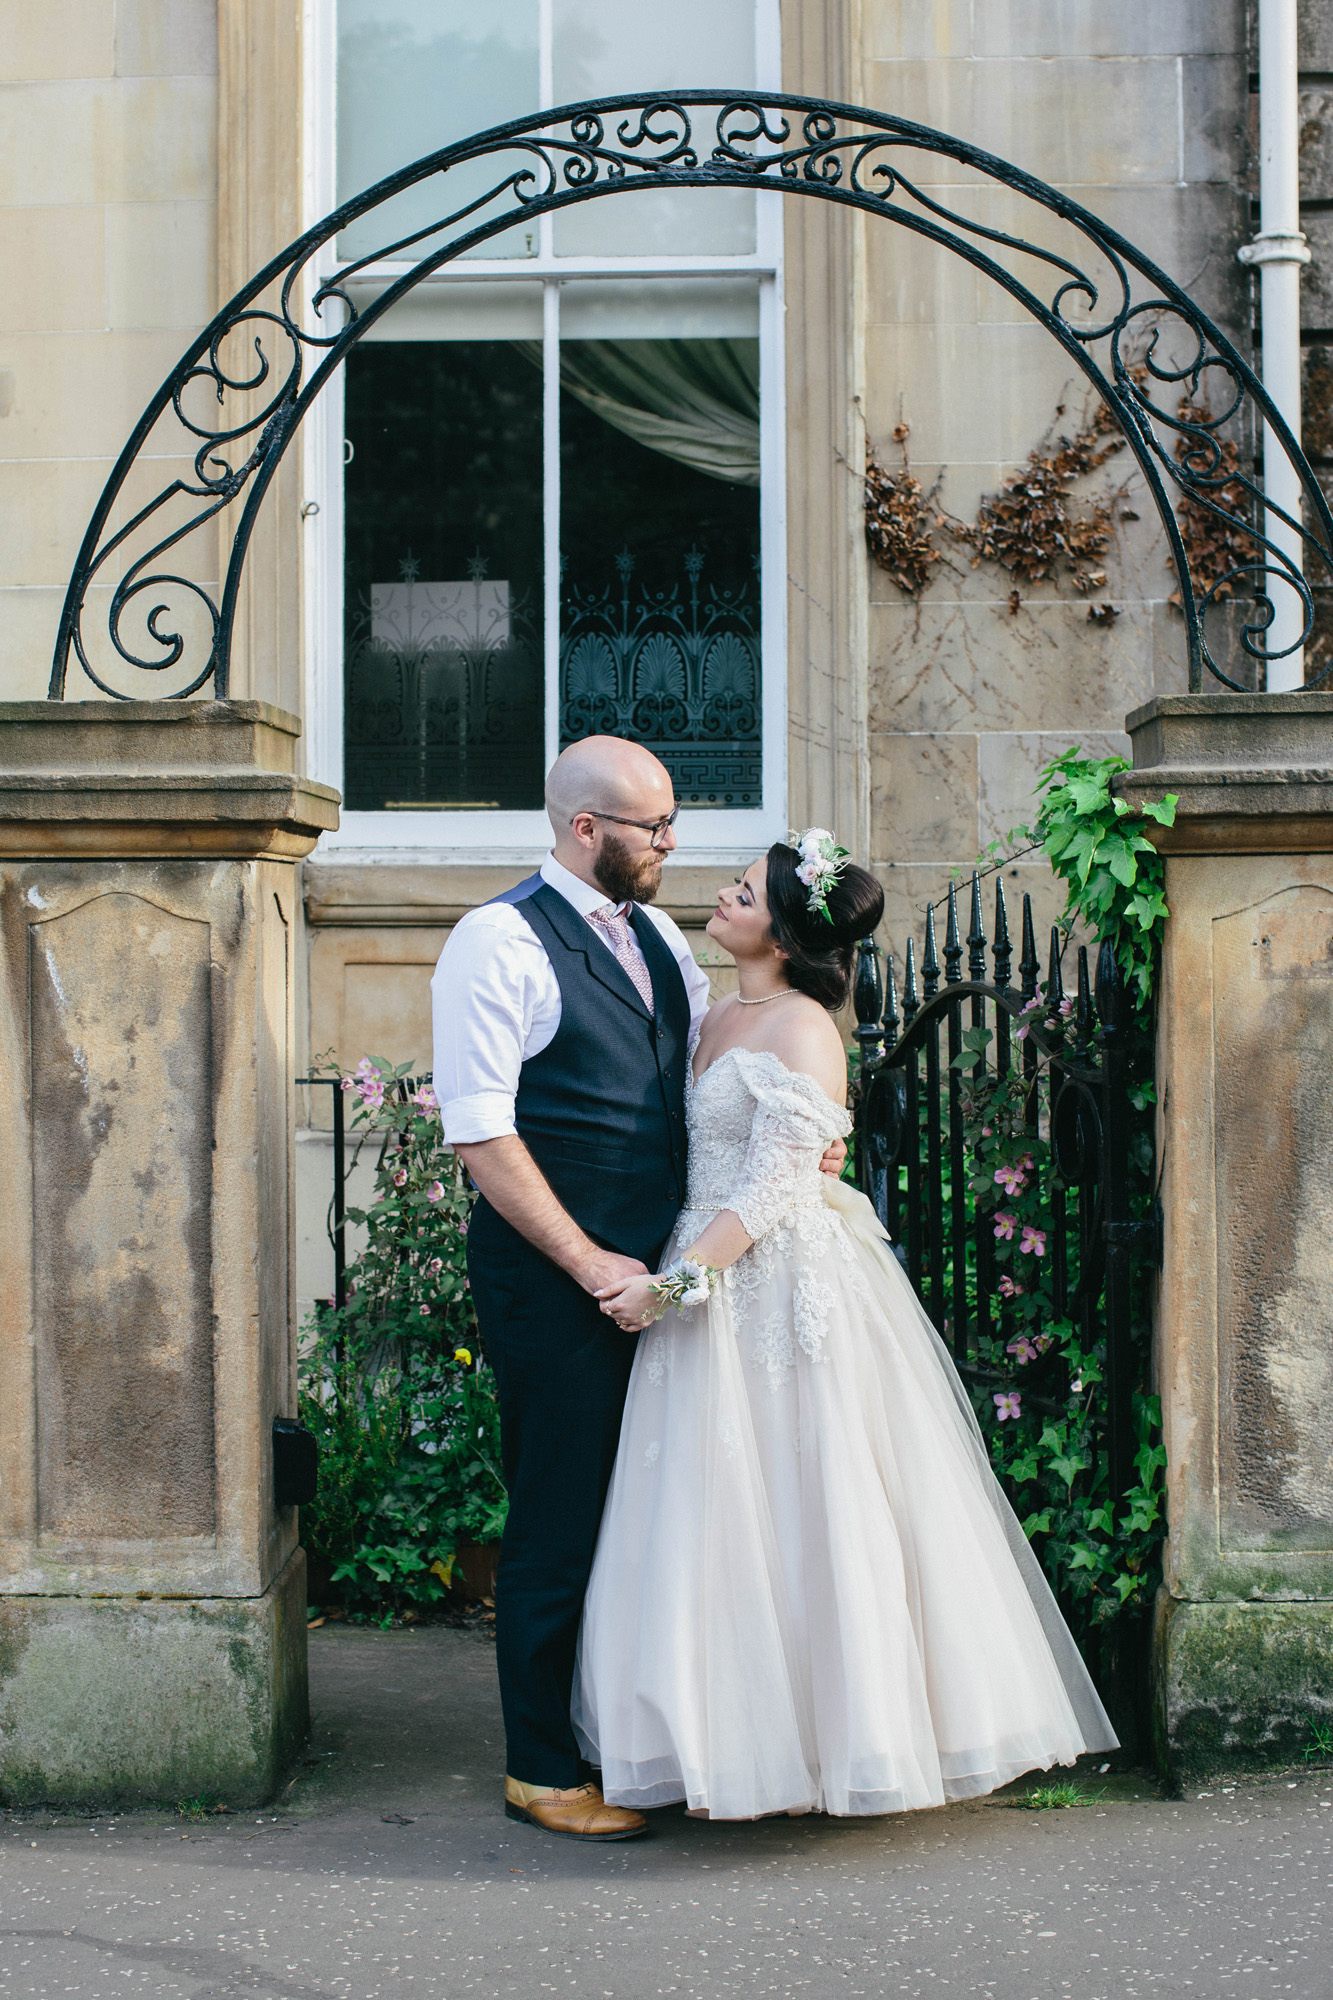 Quirky Wedding Photography Glasgow West End 072.jpg